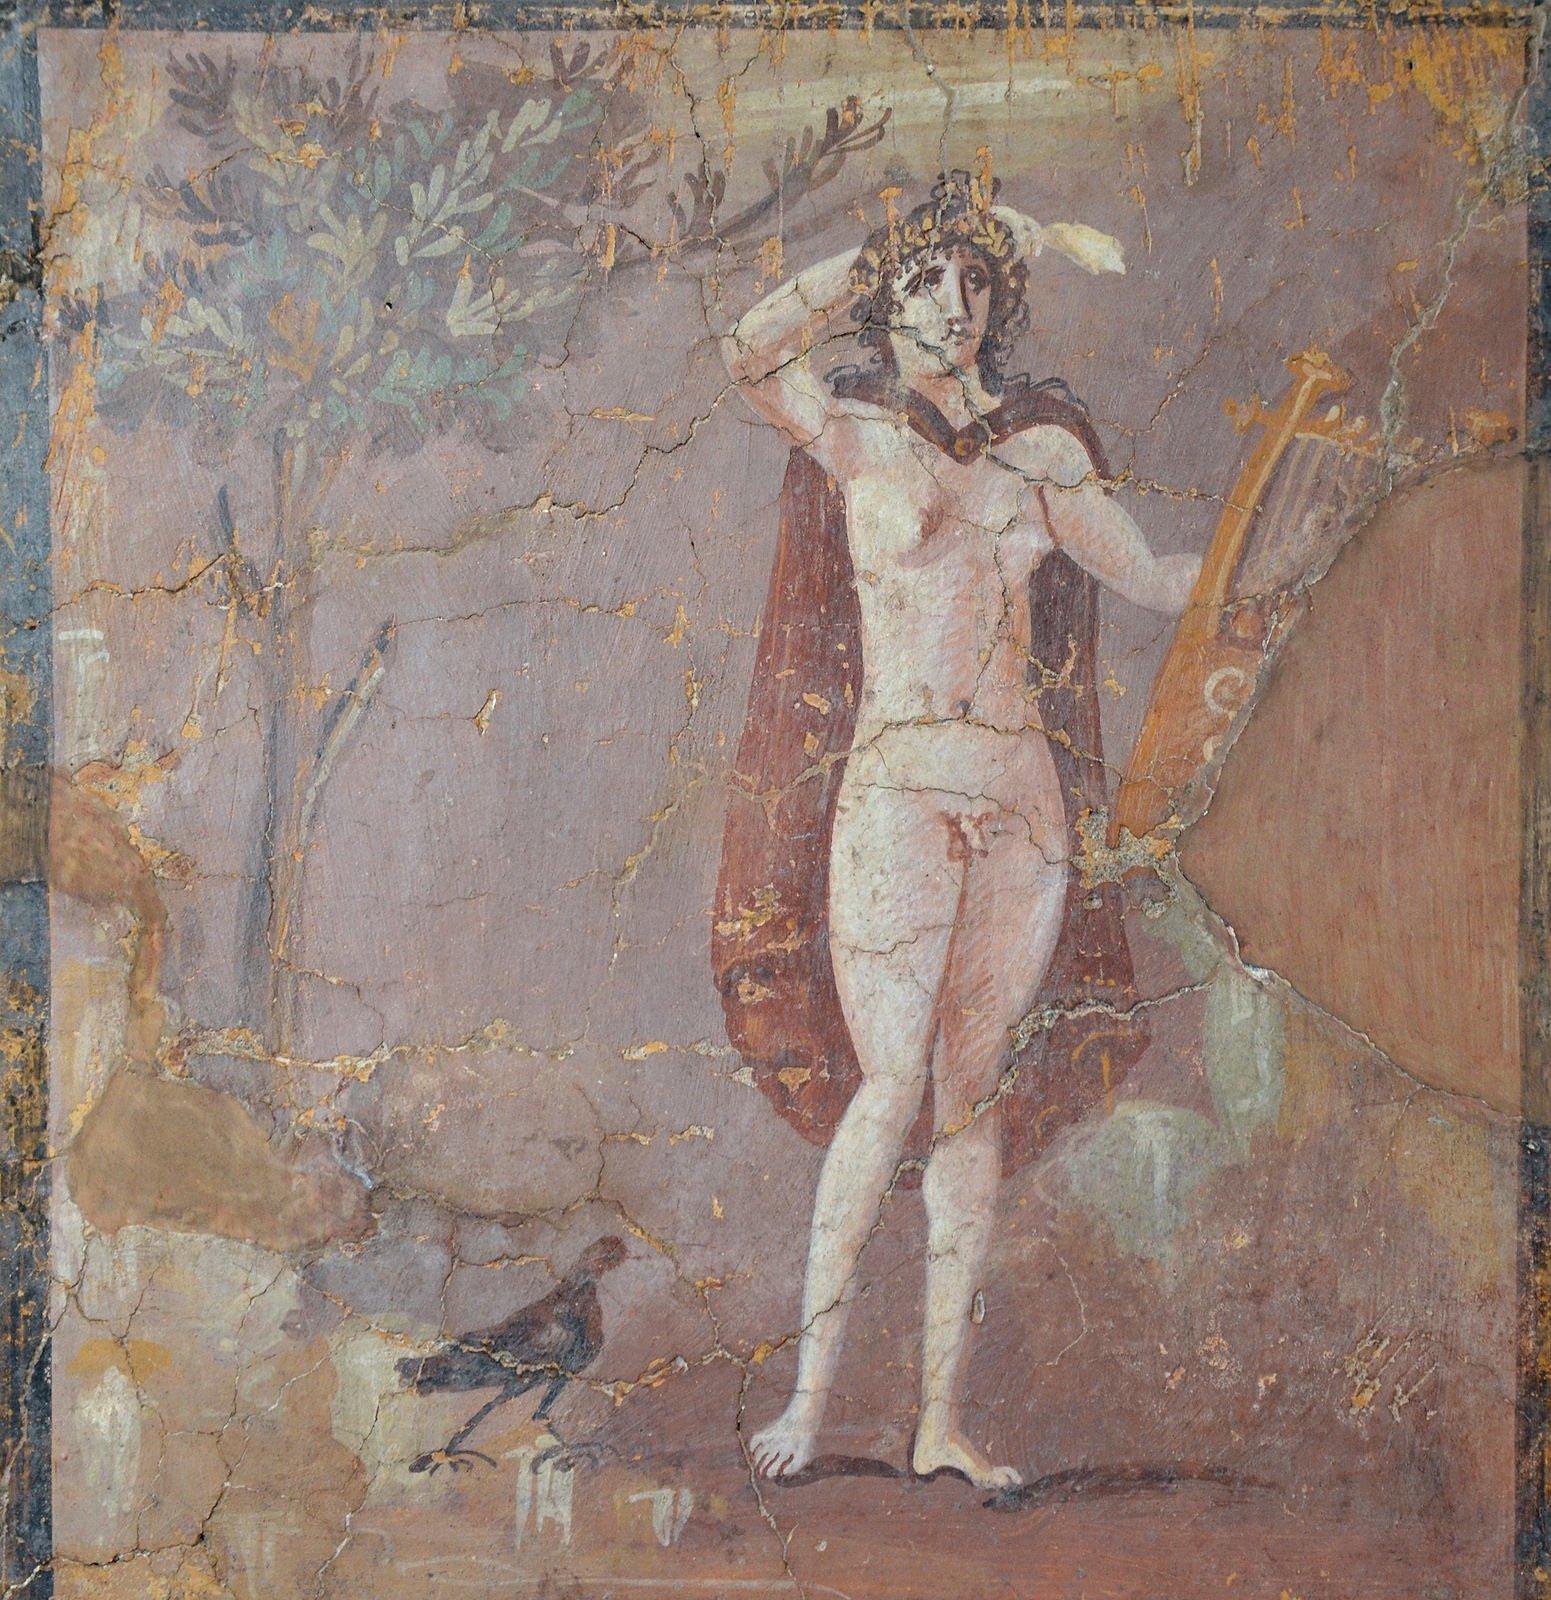 Hermaphrodite Roman Hermaphrodite Fresco